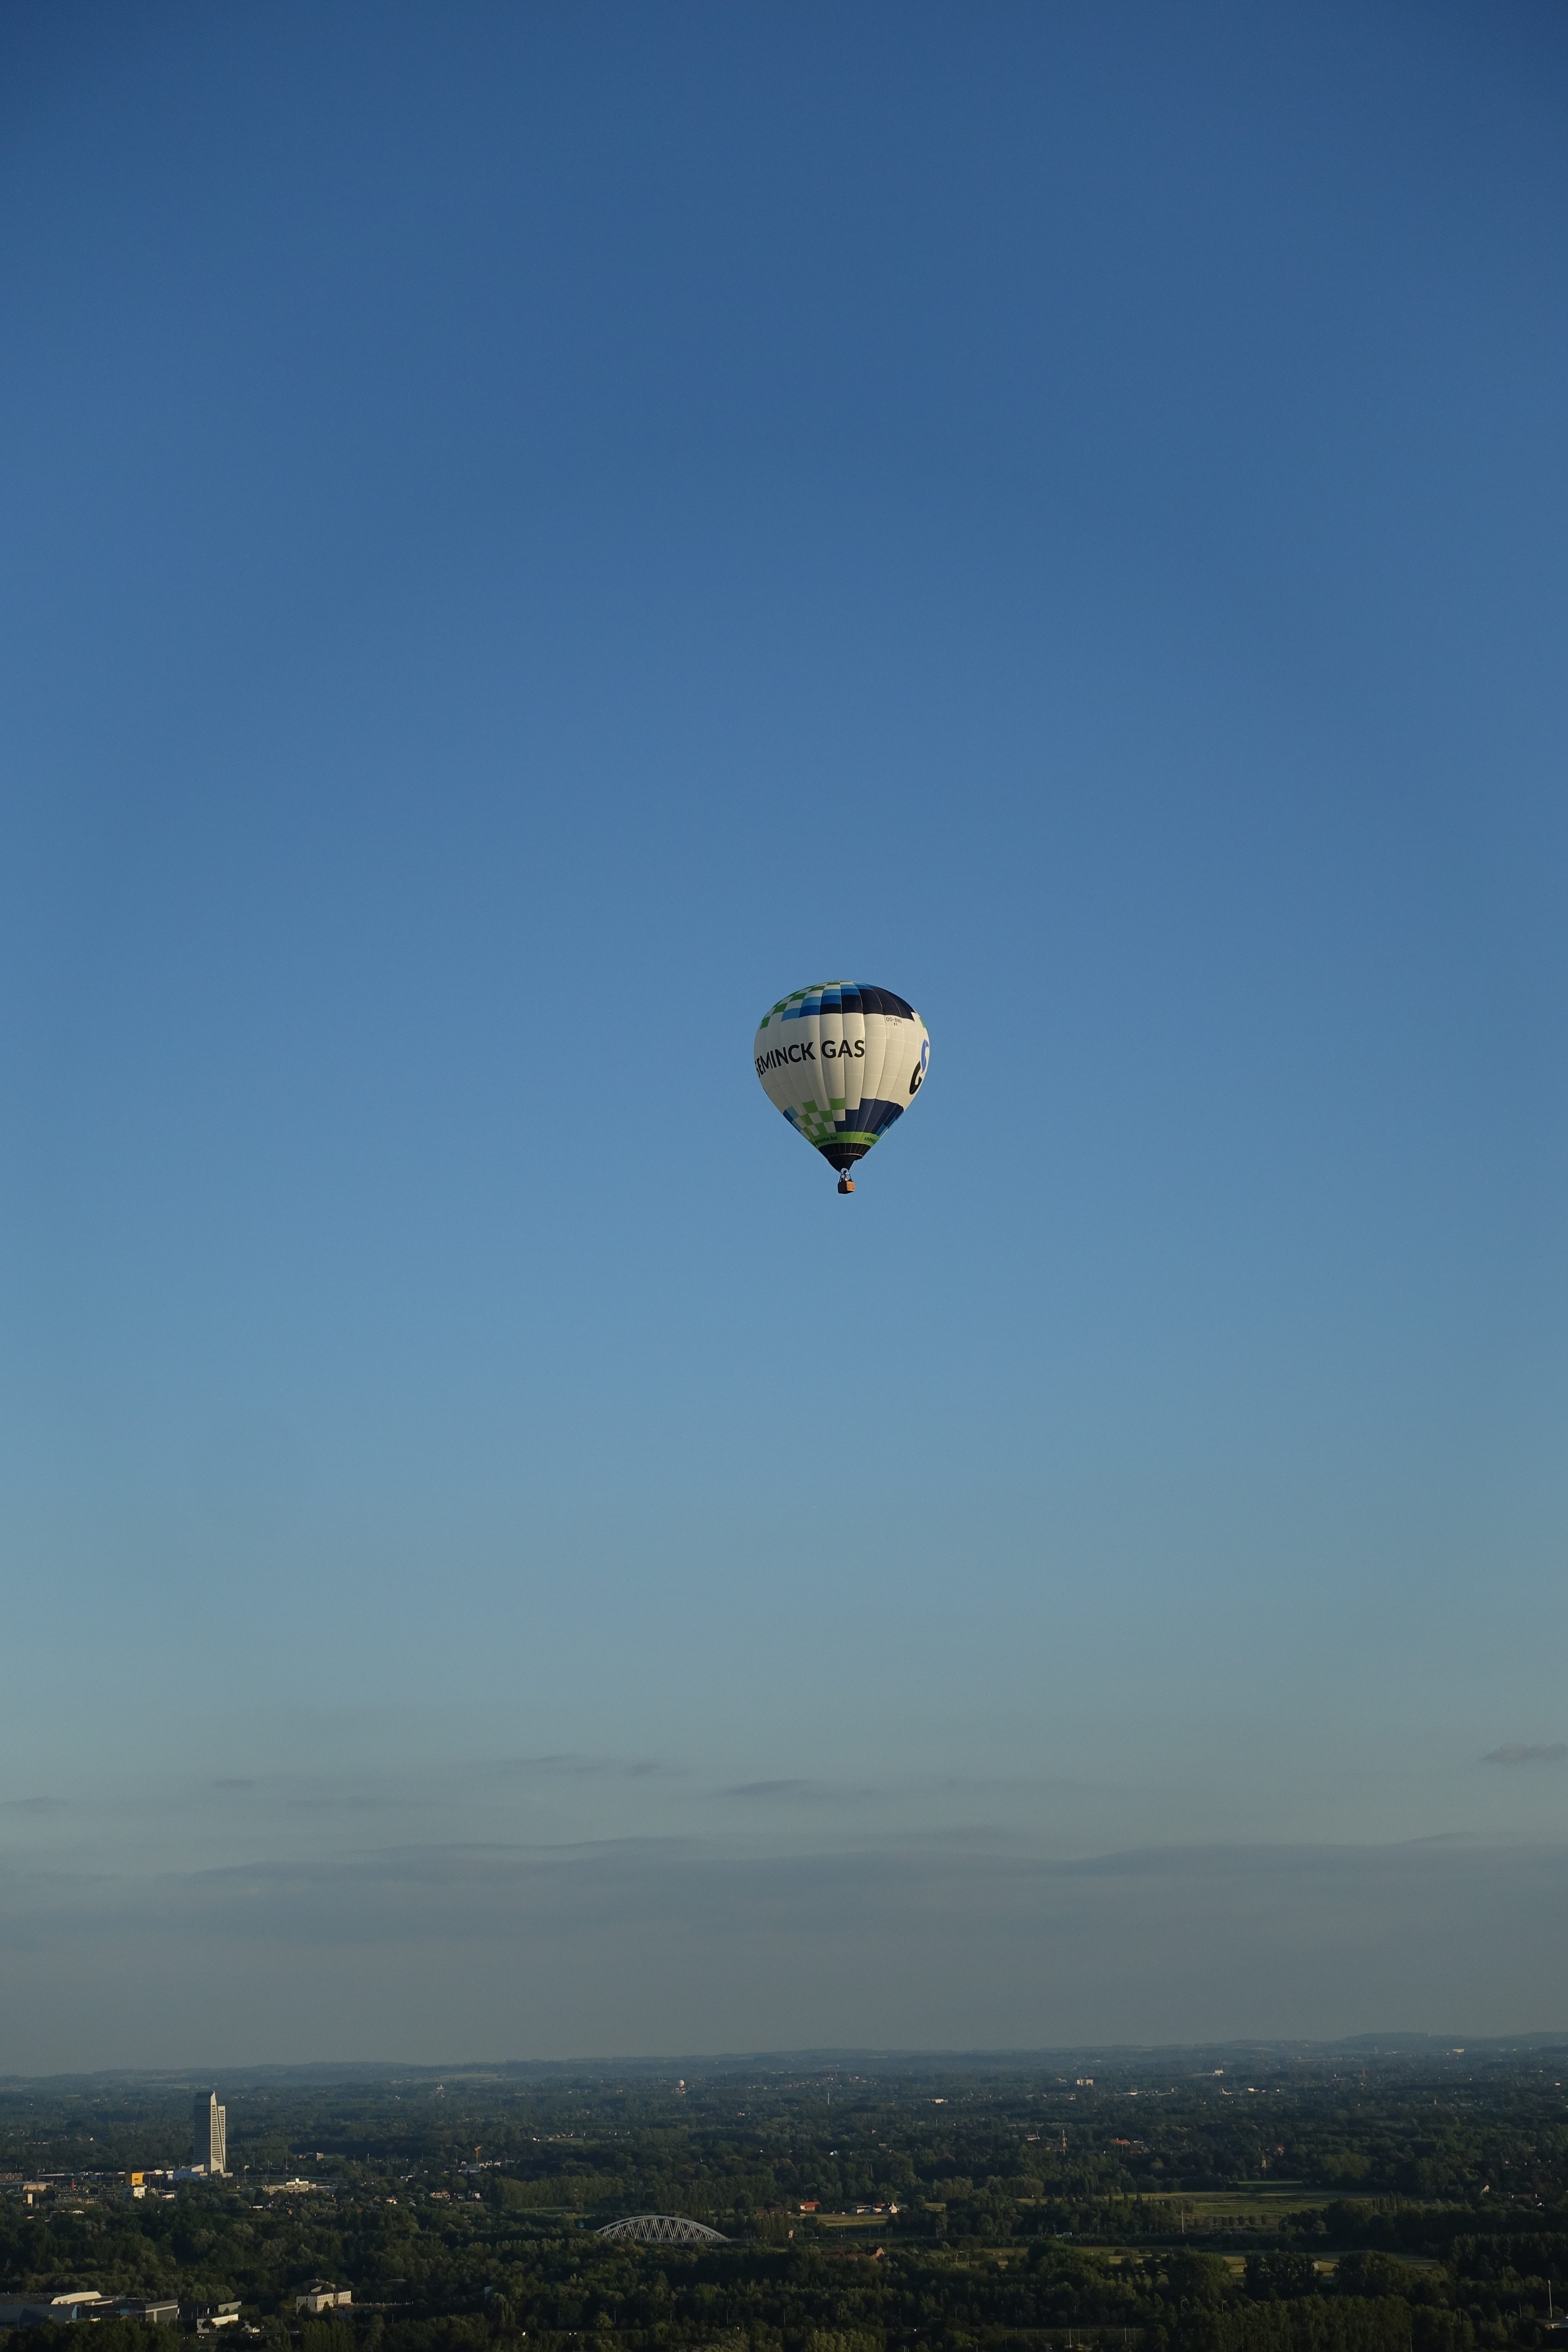 Dreamballooning Seminck Gas